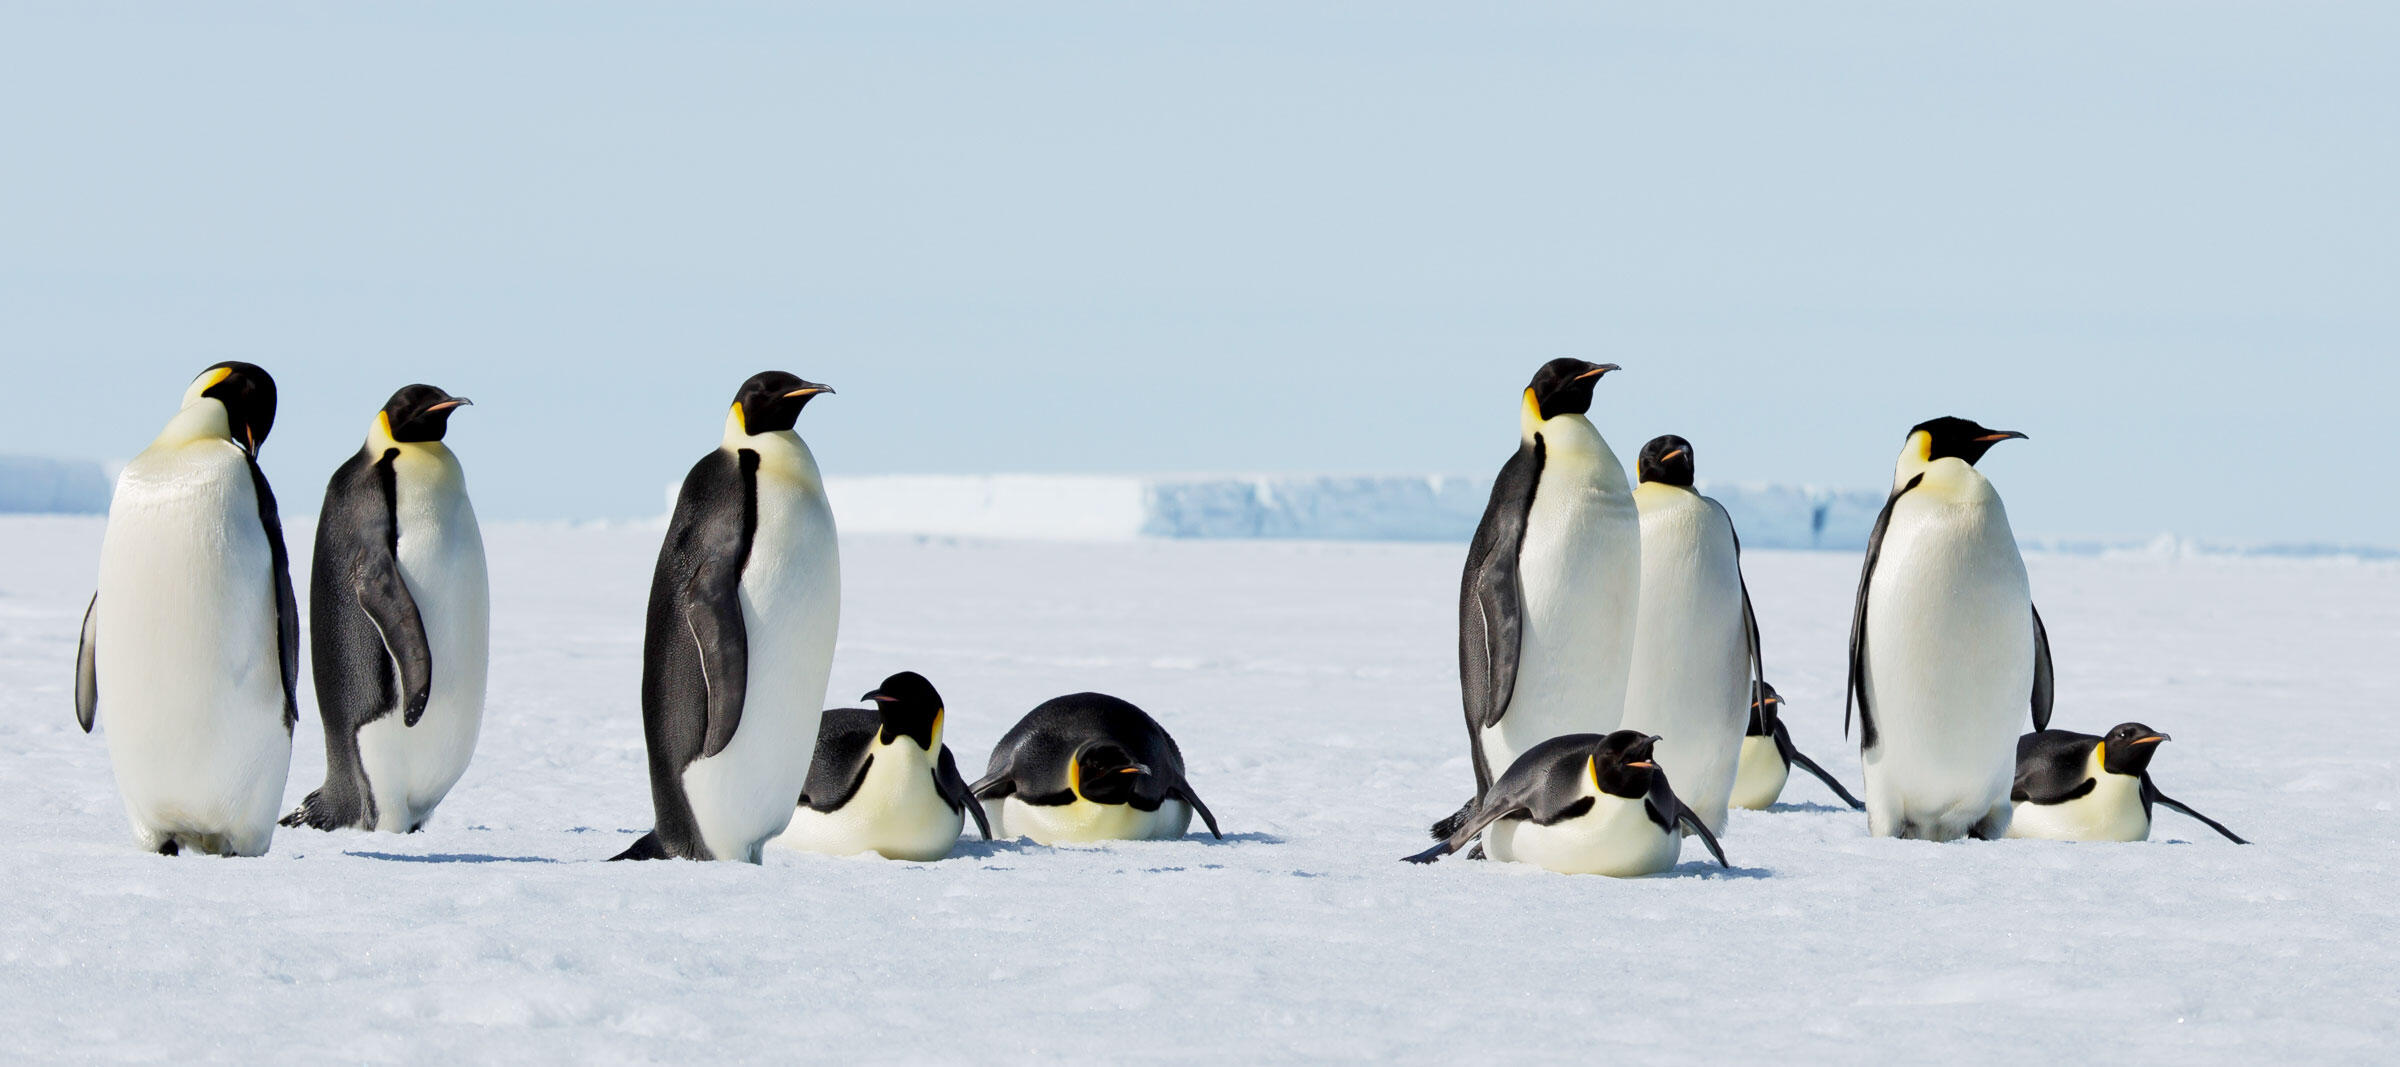 Emperor Penguins. James Lusk/Audubon Photography Awards